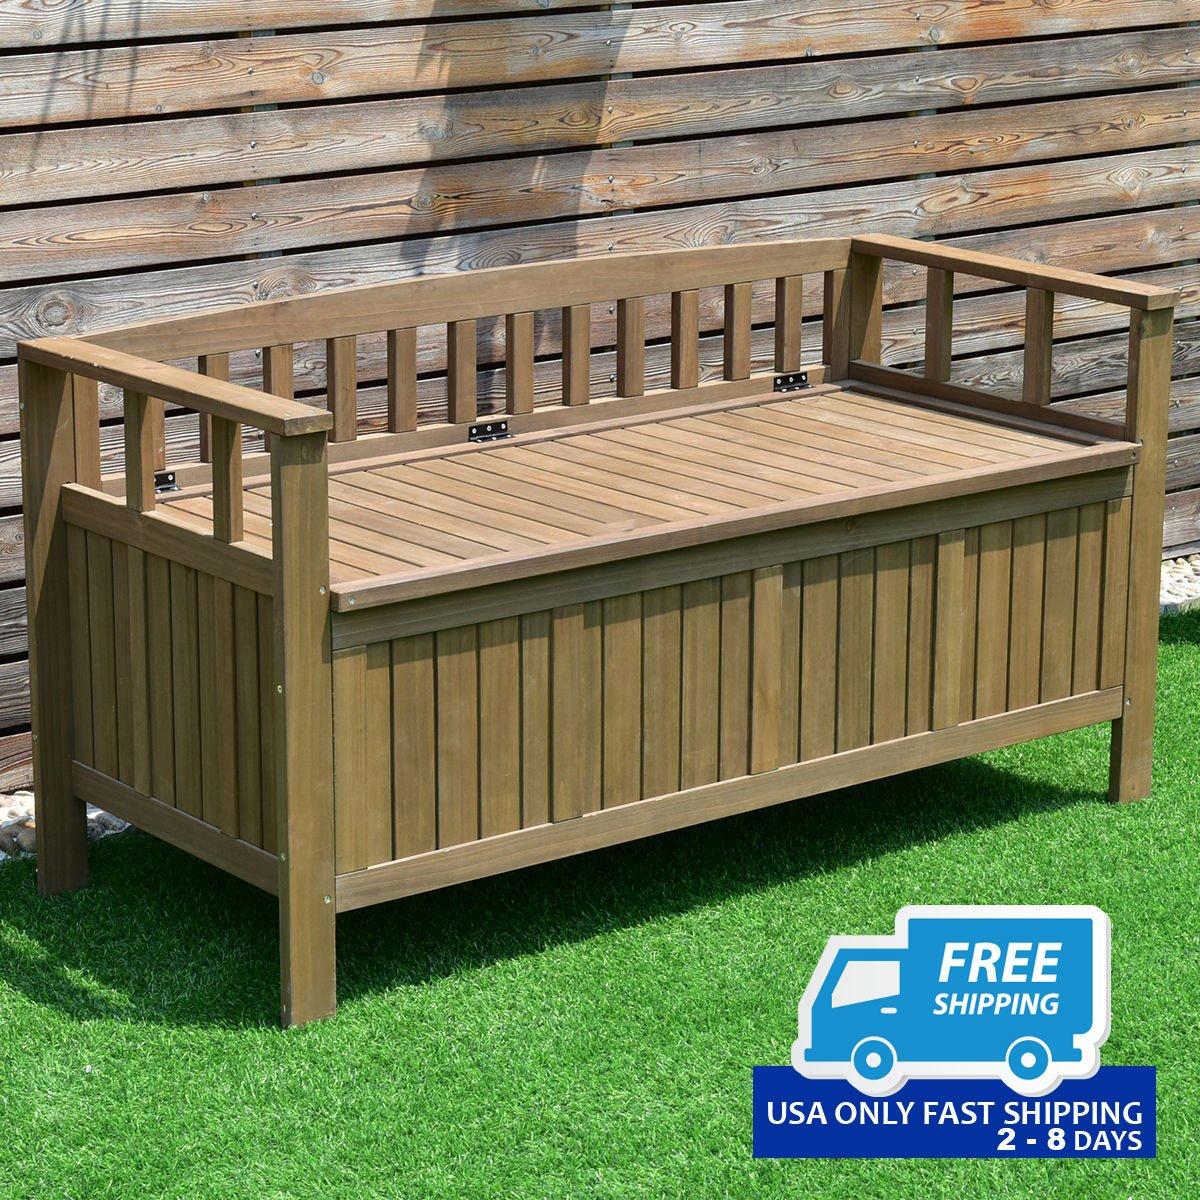 Fabulous 70 Gallon 2 In 1 Outdoor Garden Bench Storage Deck Box Machost Co Dining Chair Design Ideas Machostcouk